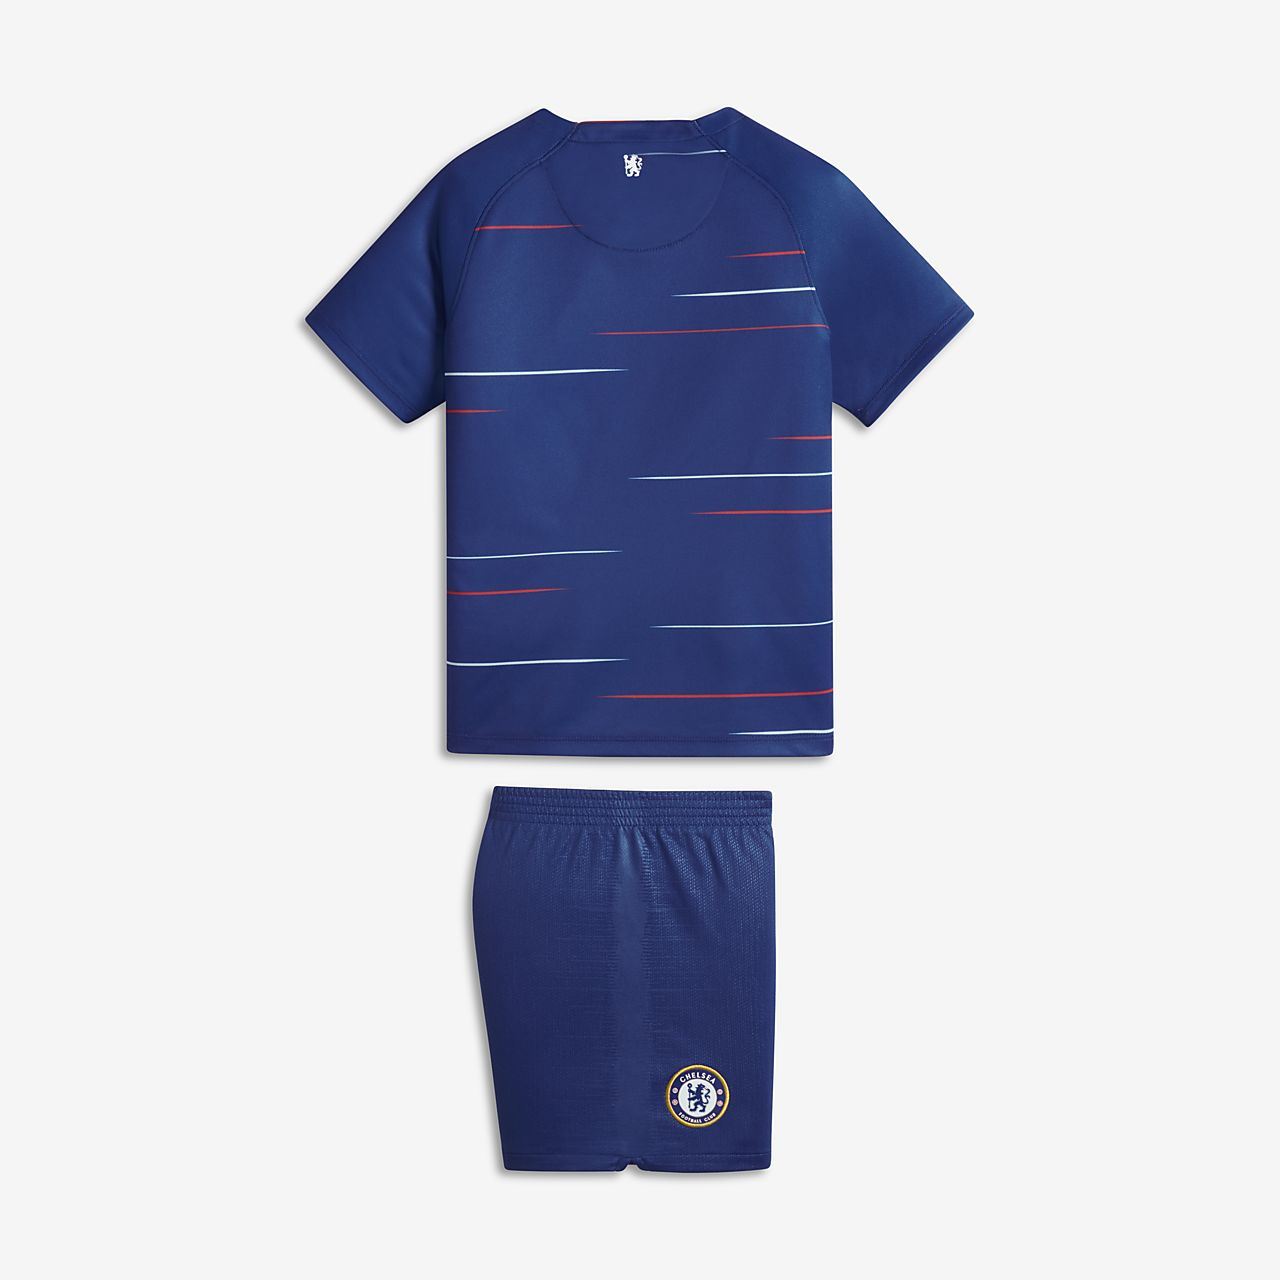 ... 2018/19 Chelsea FC Stadium Home Fußballtrikot-Set für ältere Kinder